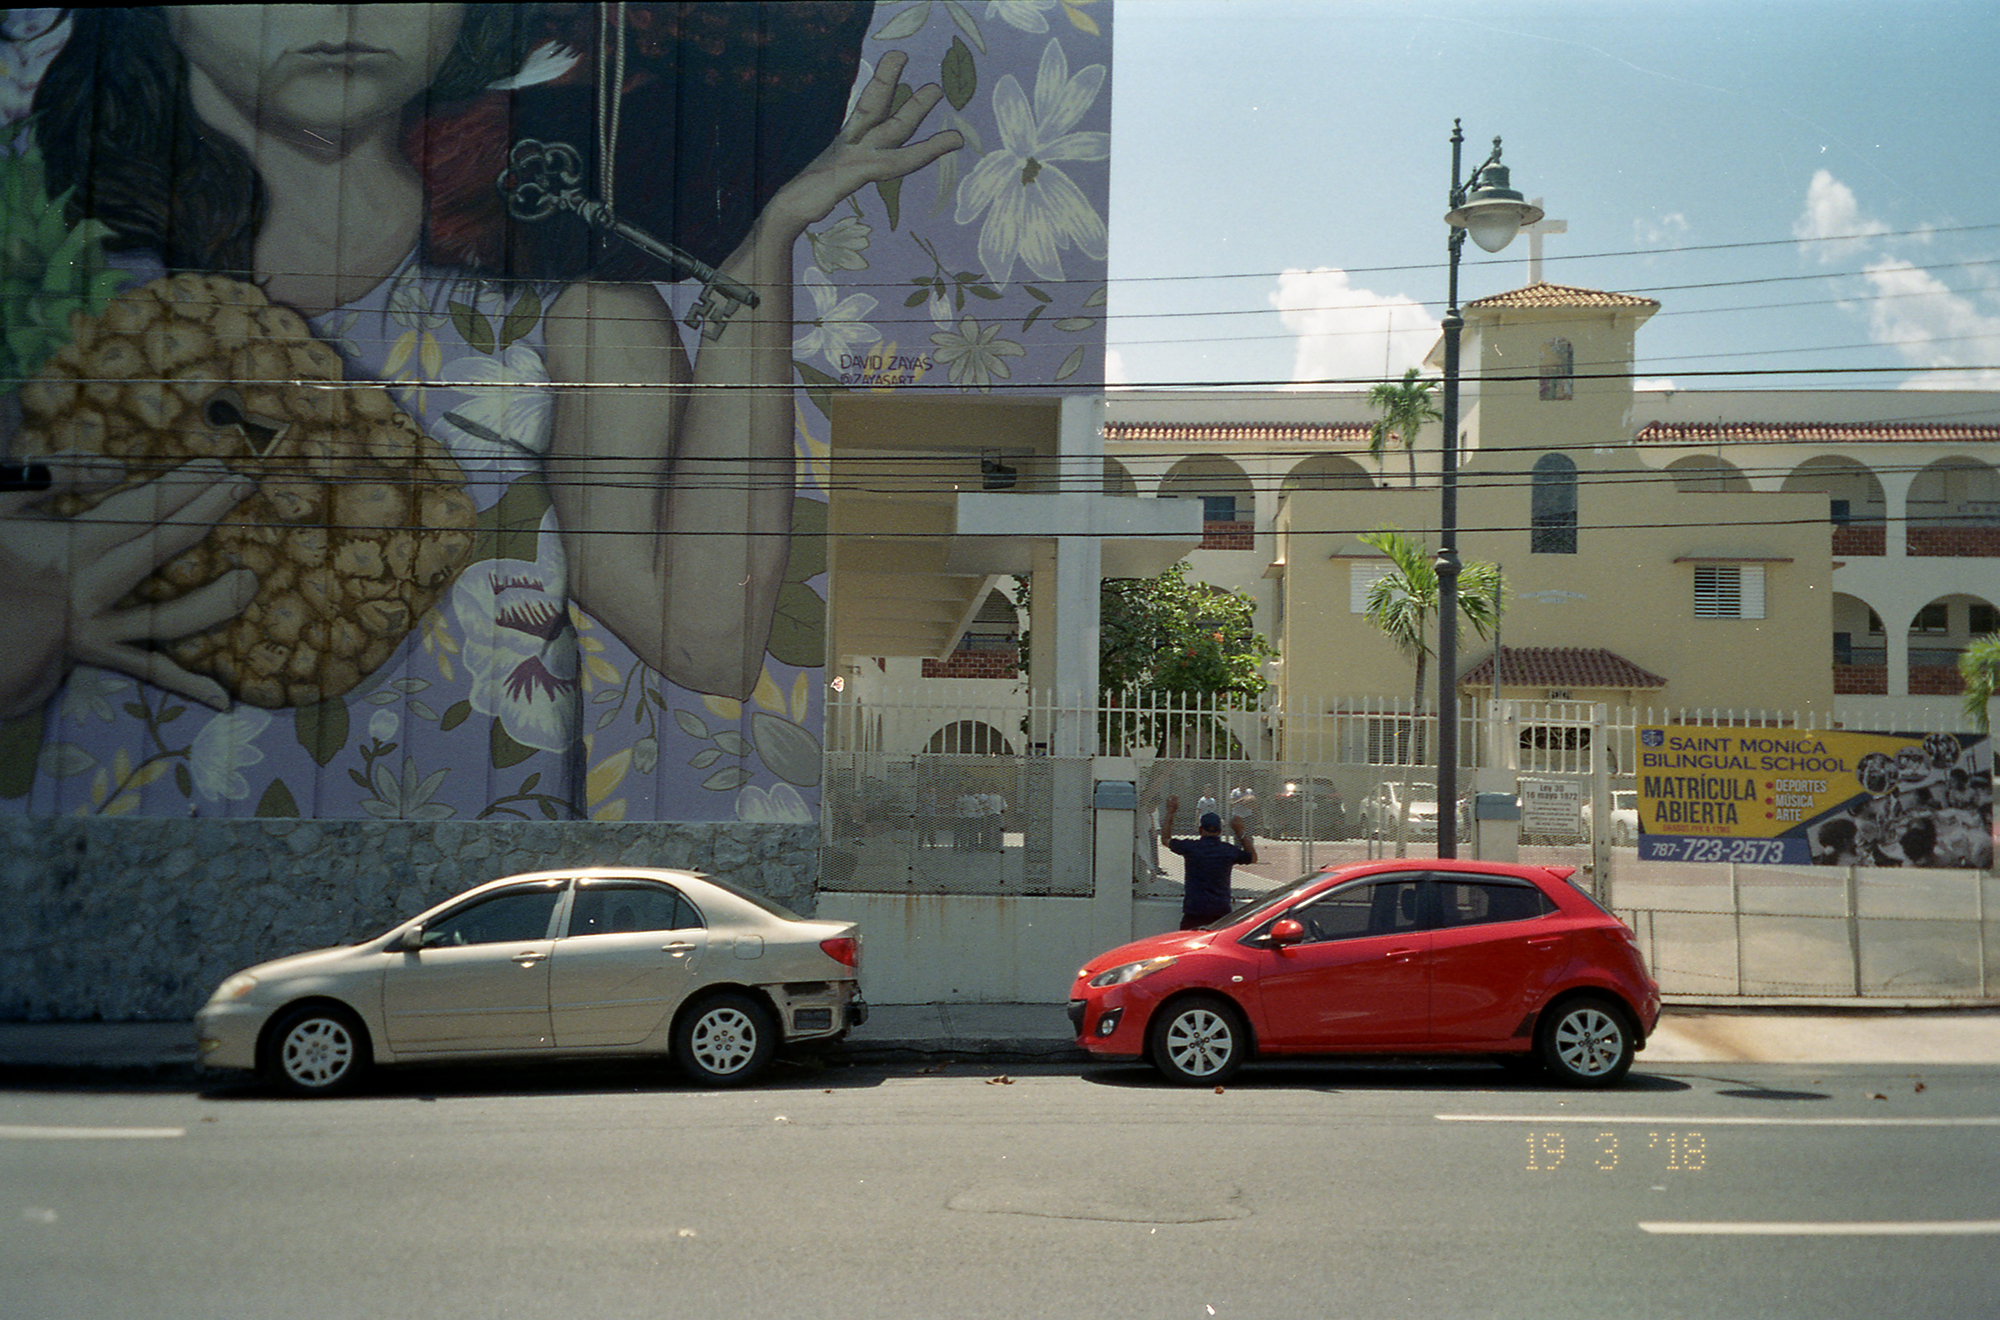 20180319_PuertoRico8_005.jpg